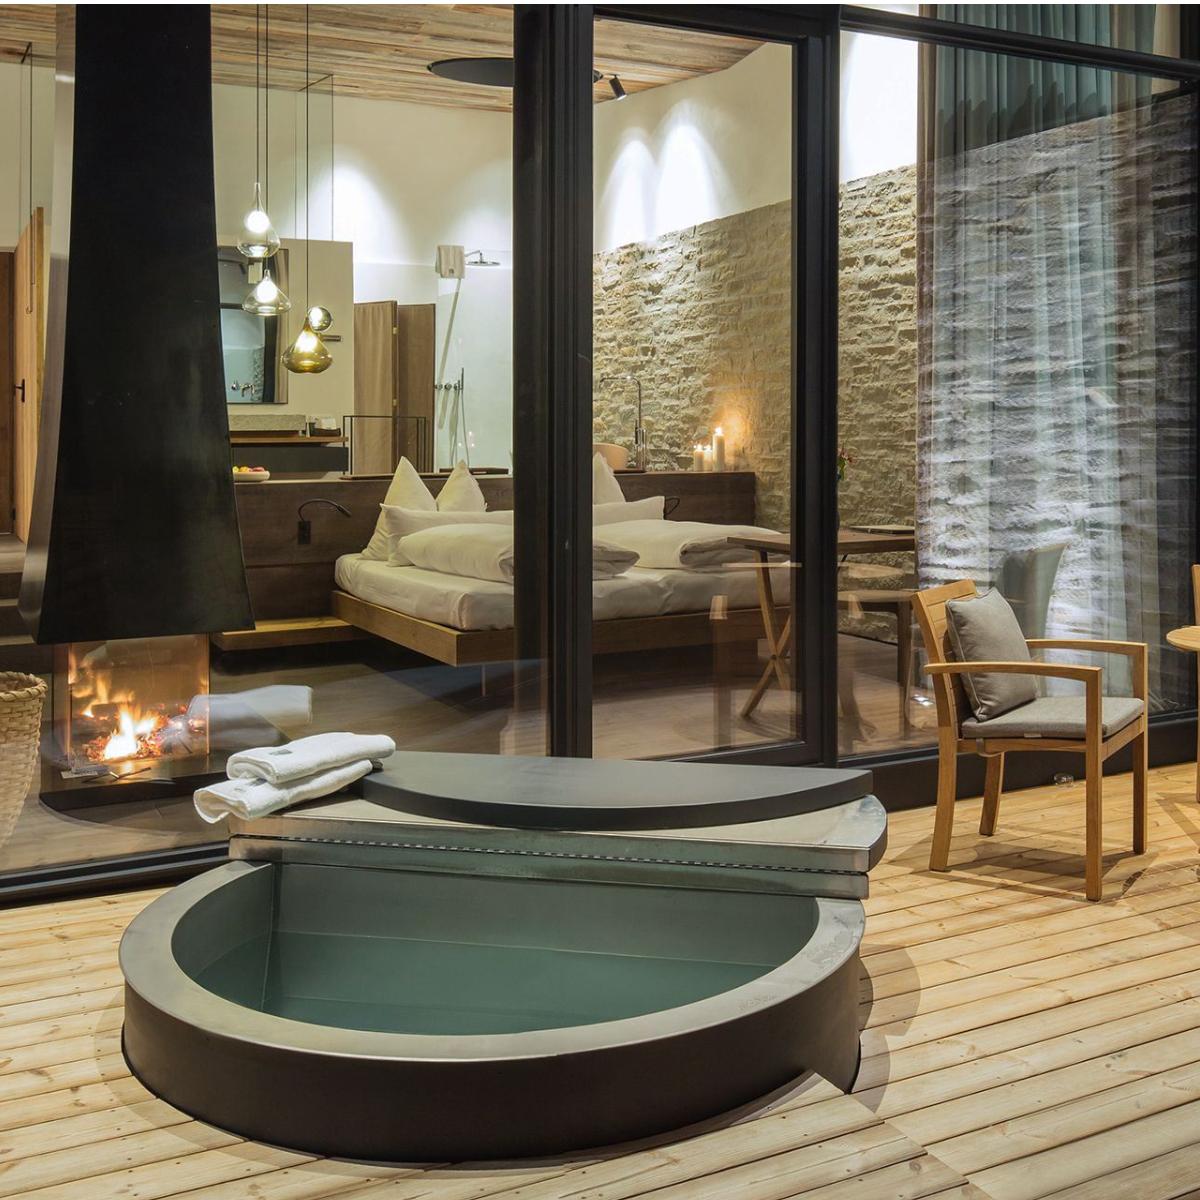 Wiesergut I Member of Design Hotels (5)